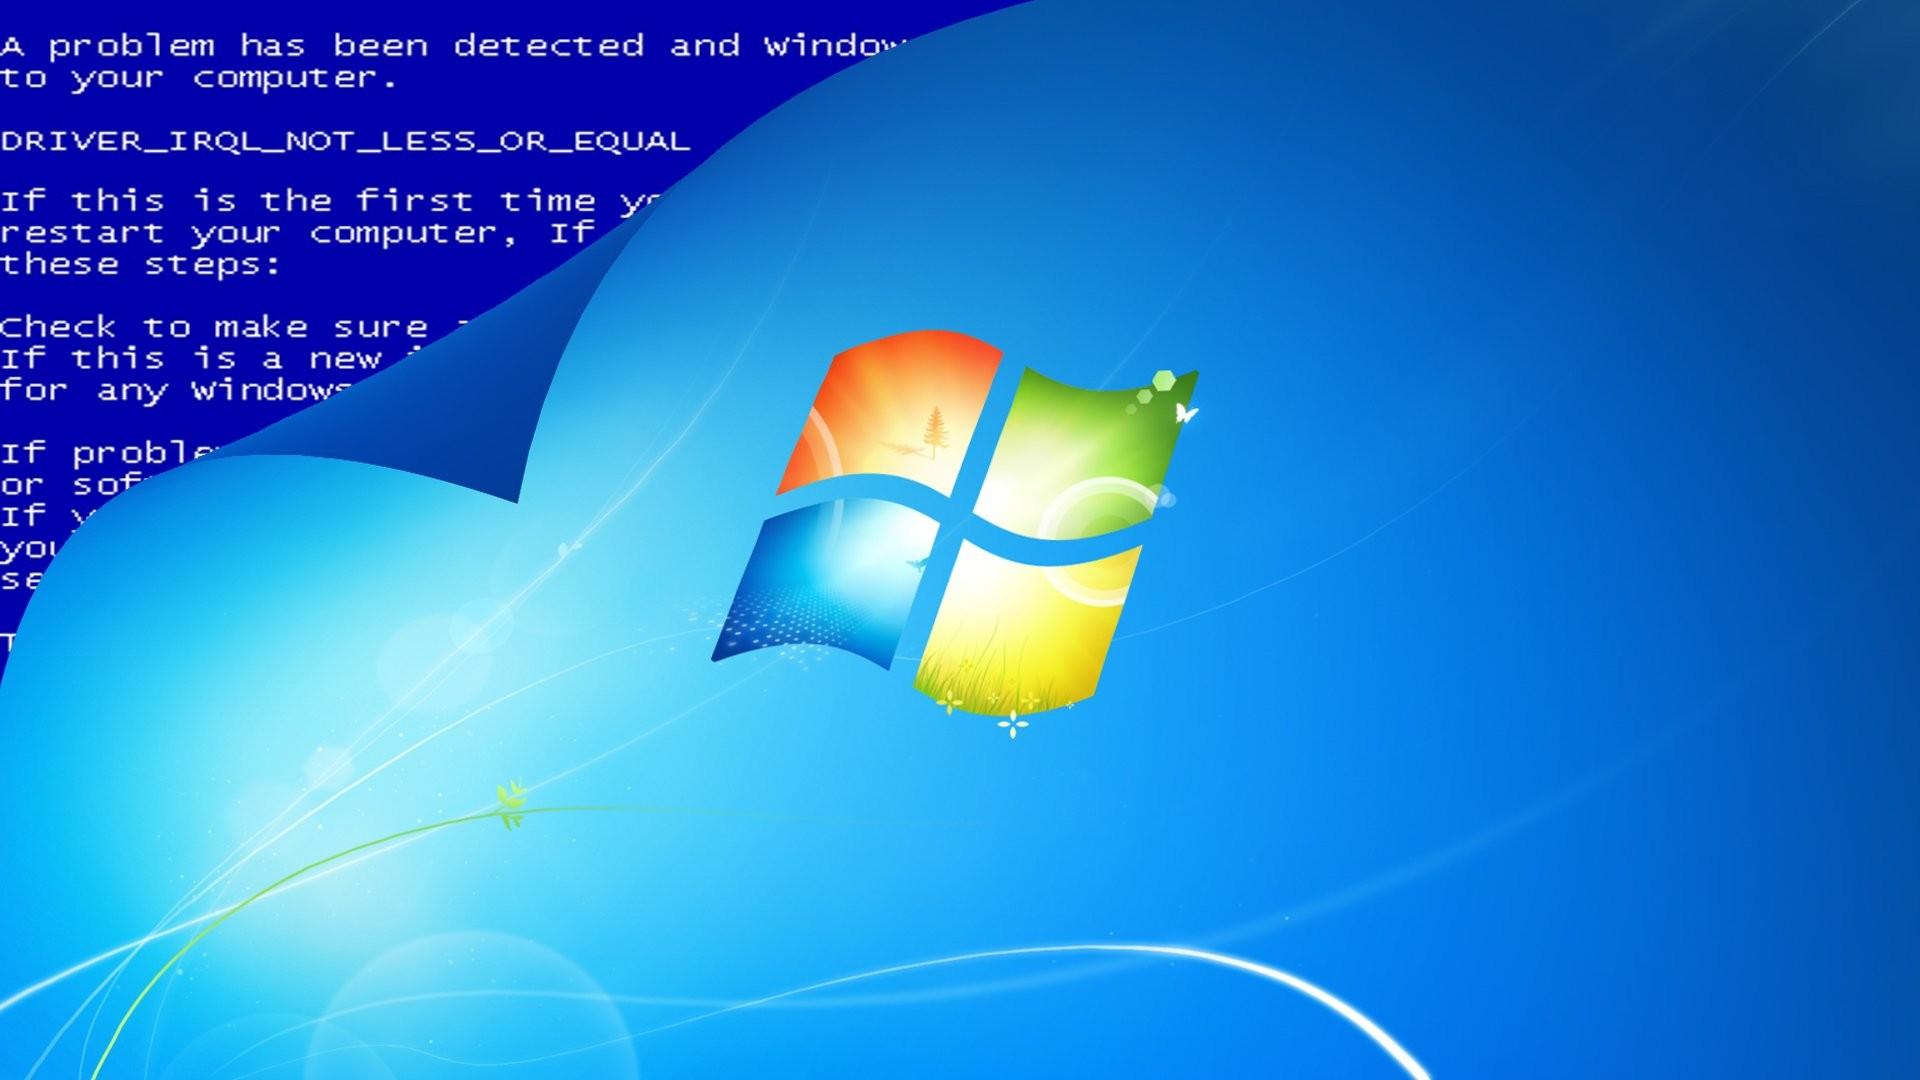 Very Funny Wallpapers For Desktop Funny Desktop: Tardis Wallpaper For Windows (69+ Images